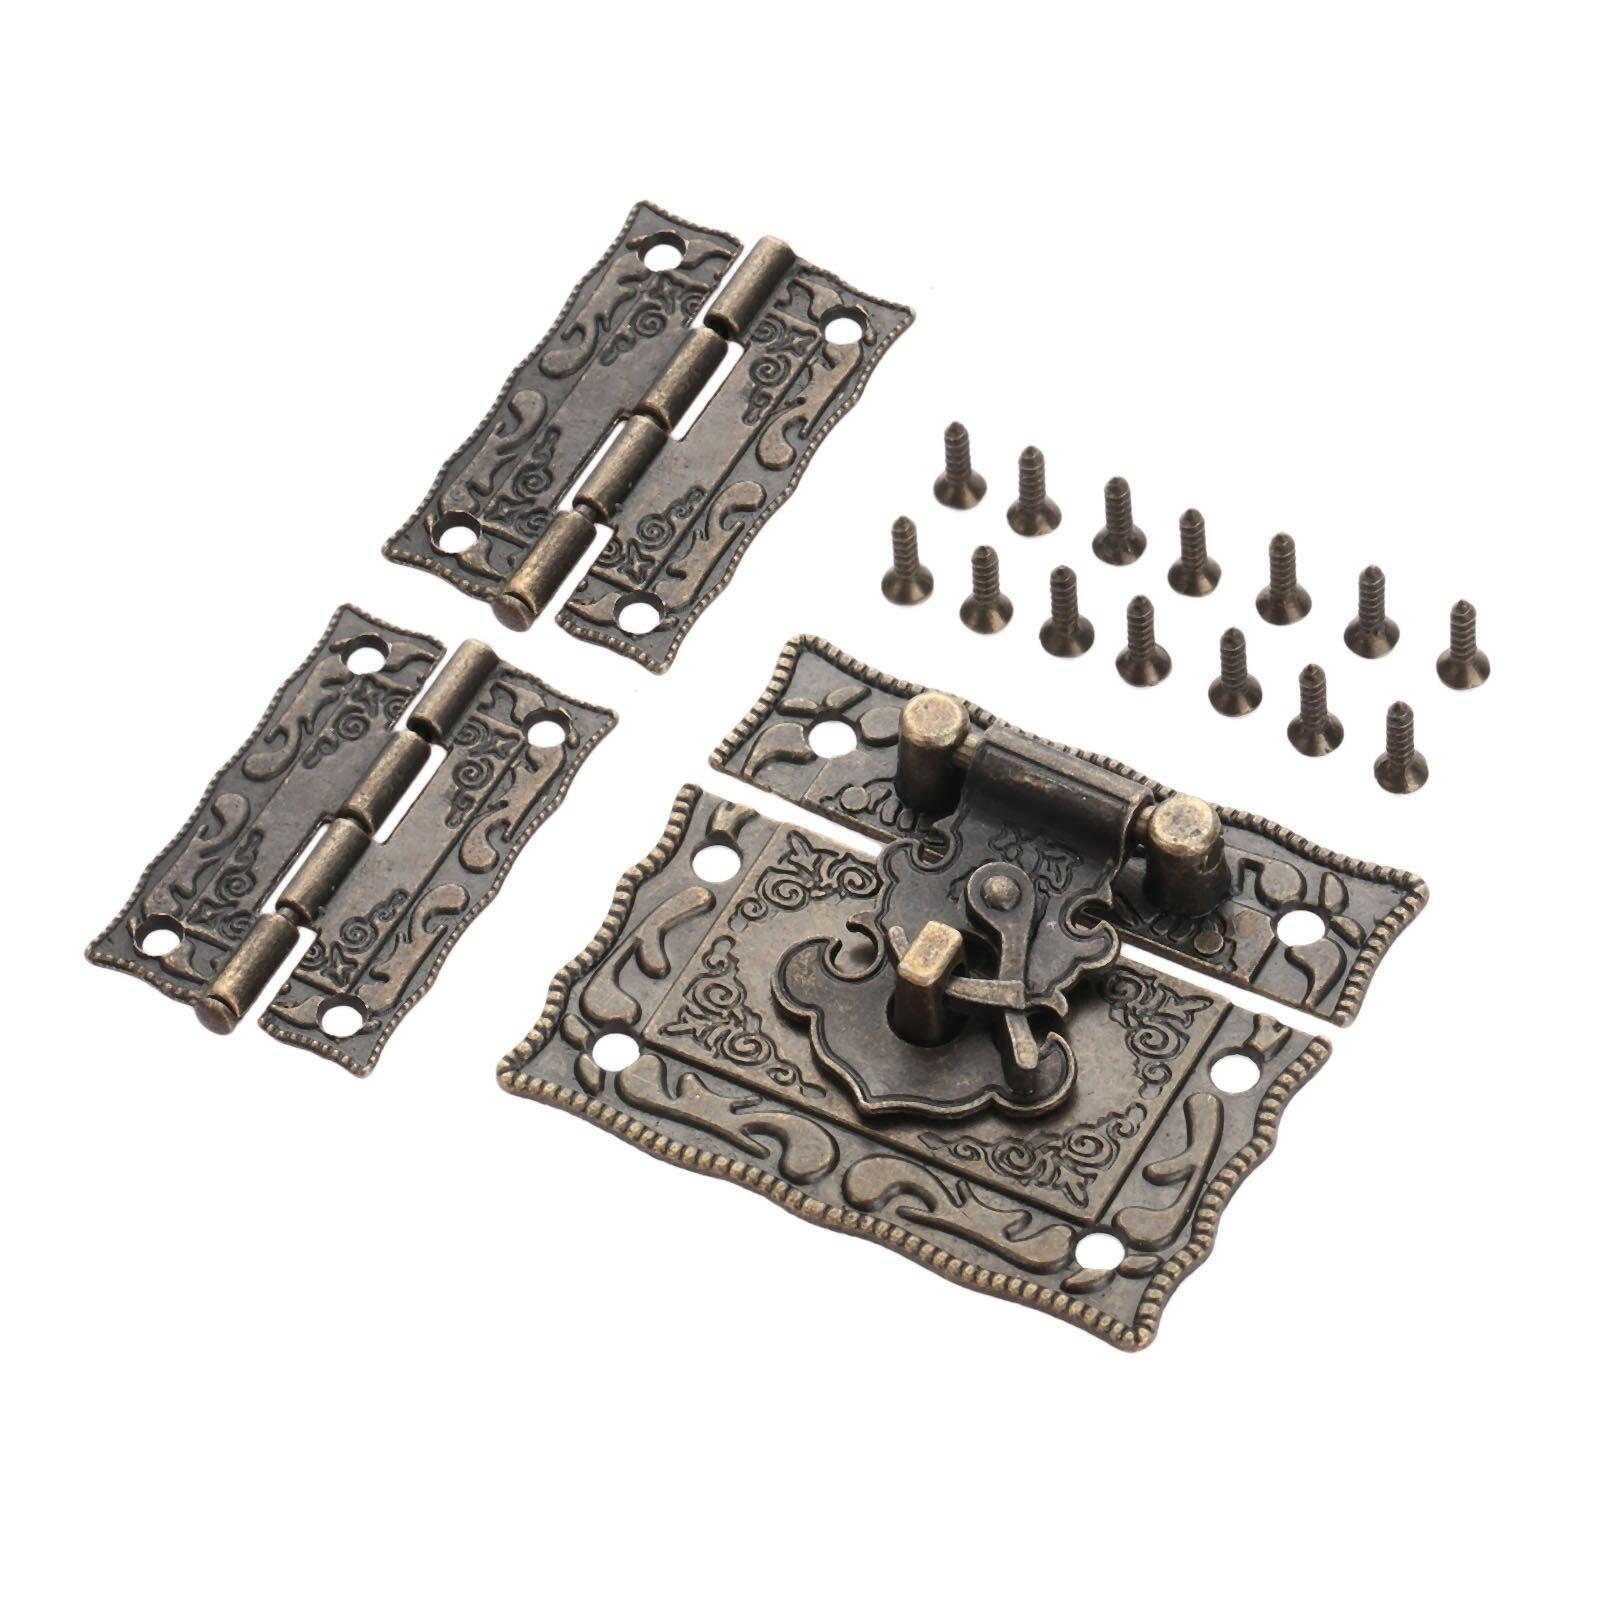 Antique Bronze Padlock Lock Jewelry Wood Box Latch Hasp Clasp +2pcs Suitcase Cabinet Hinge Vintage Furniture Decorative Hardware